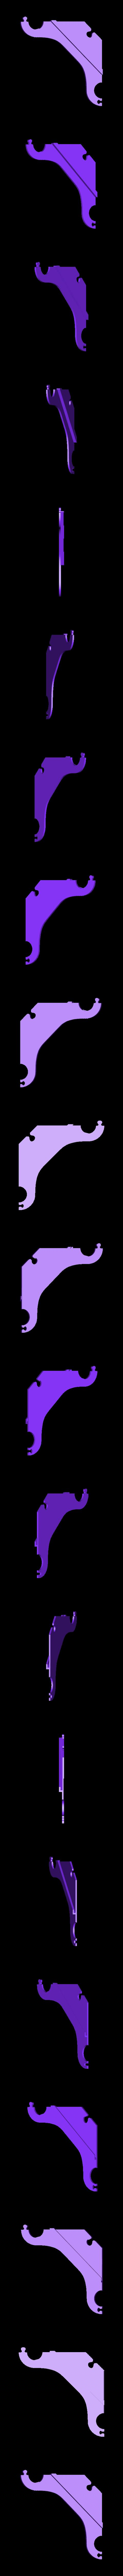 portomine_part_g_b01.STL Download STL file Portomine Liberty mirror & coat hooks • Model to 3D print, Tibe-Design